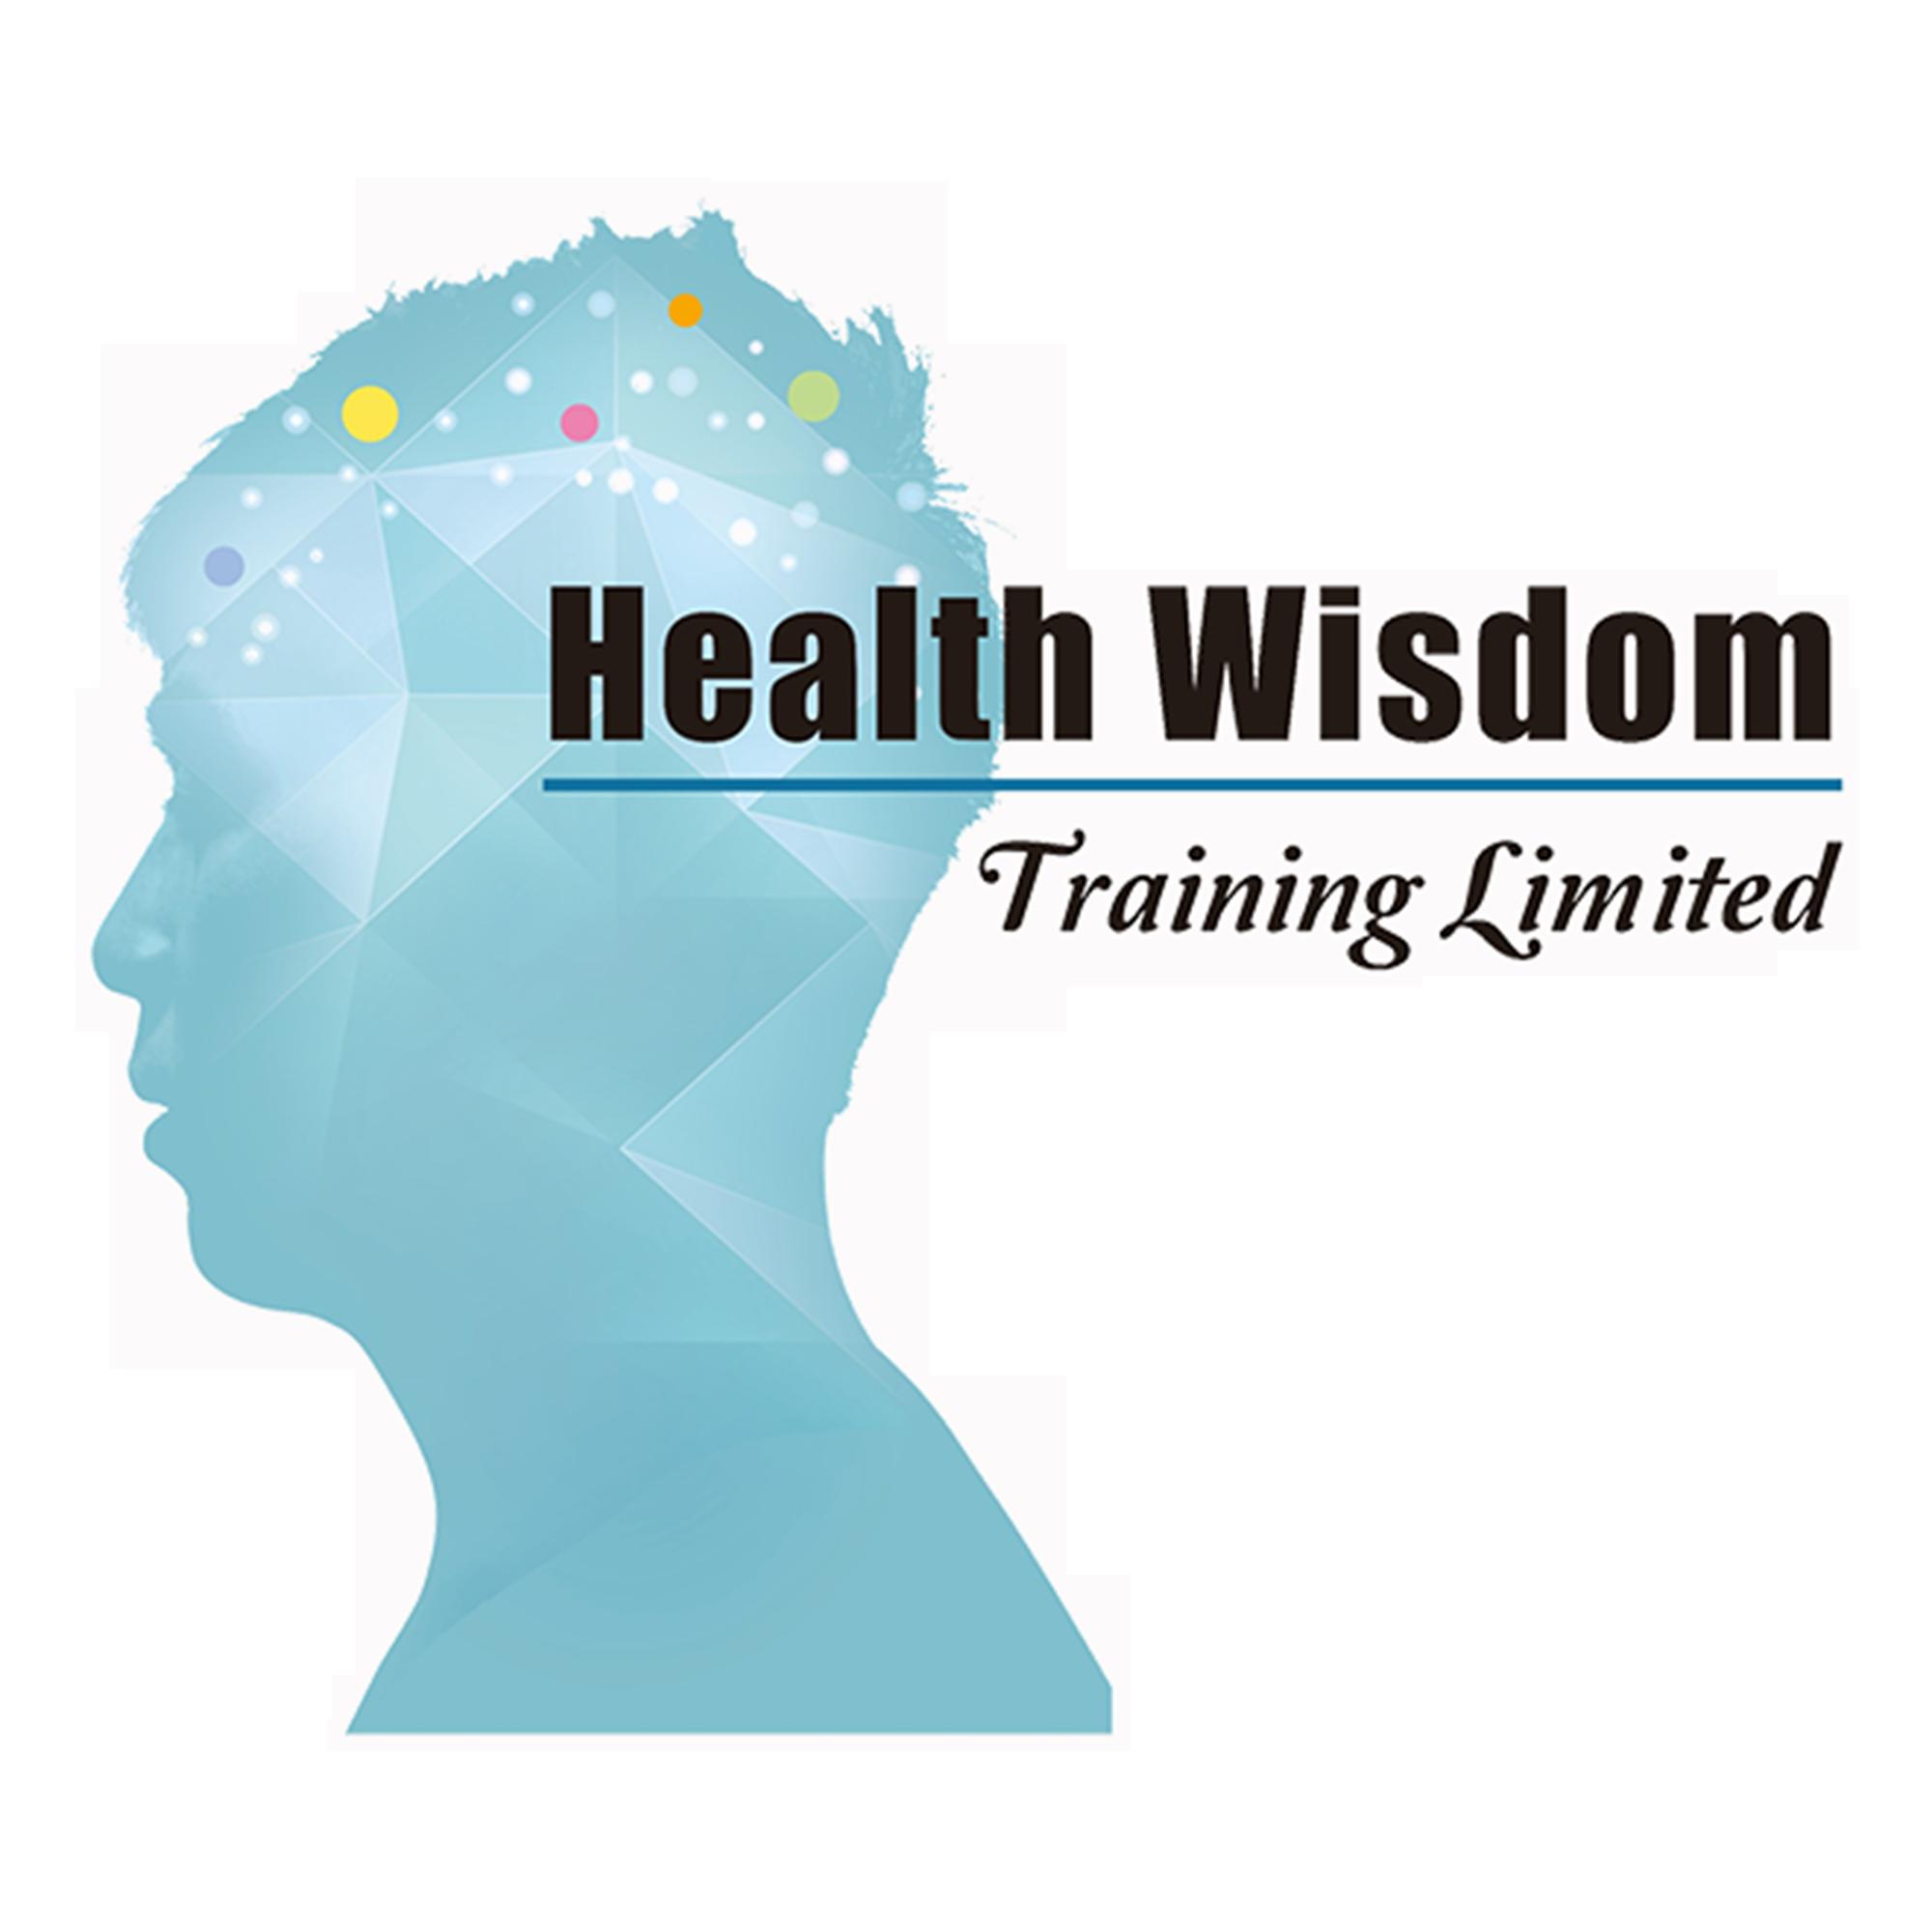 Health Wisdom Training